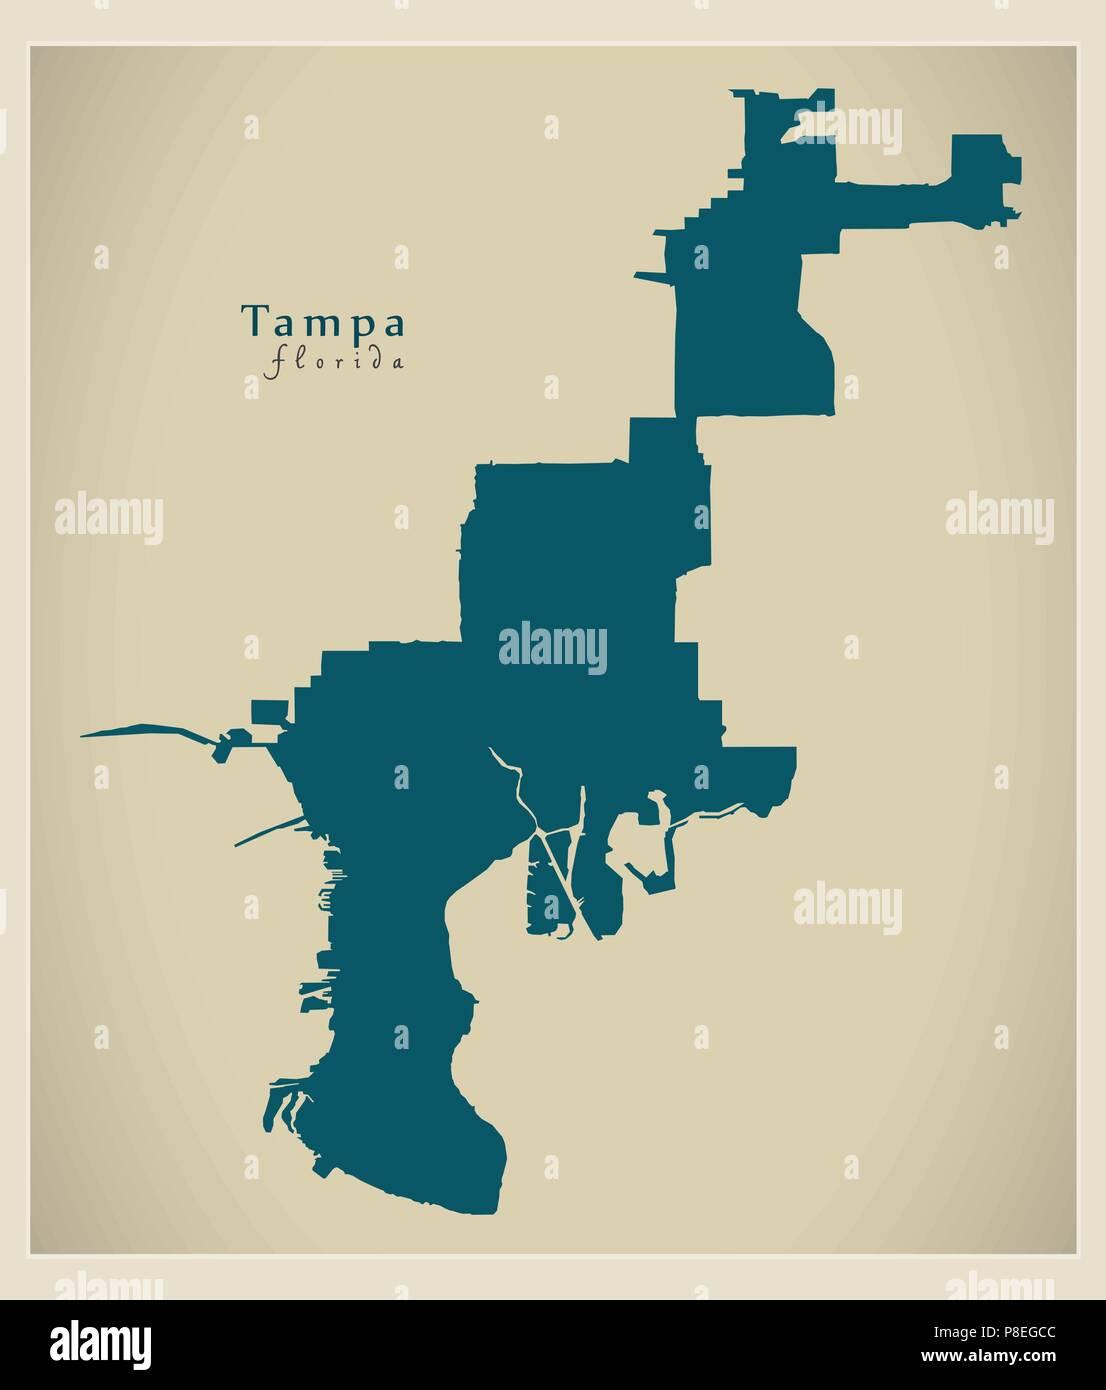 Map Of Tampa Florida Area.Modern City Map Tampa Florida City Of The Usa Stock Vector Art